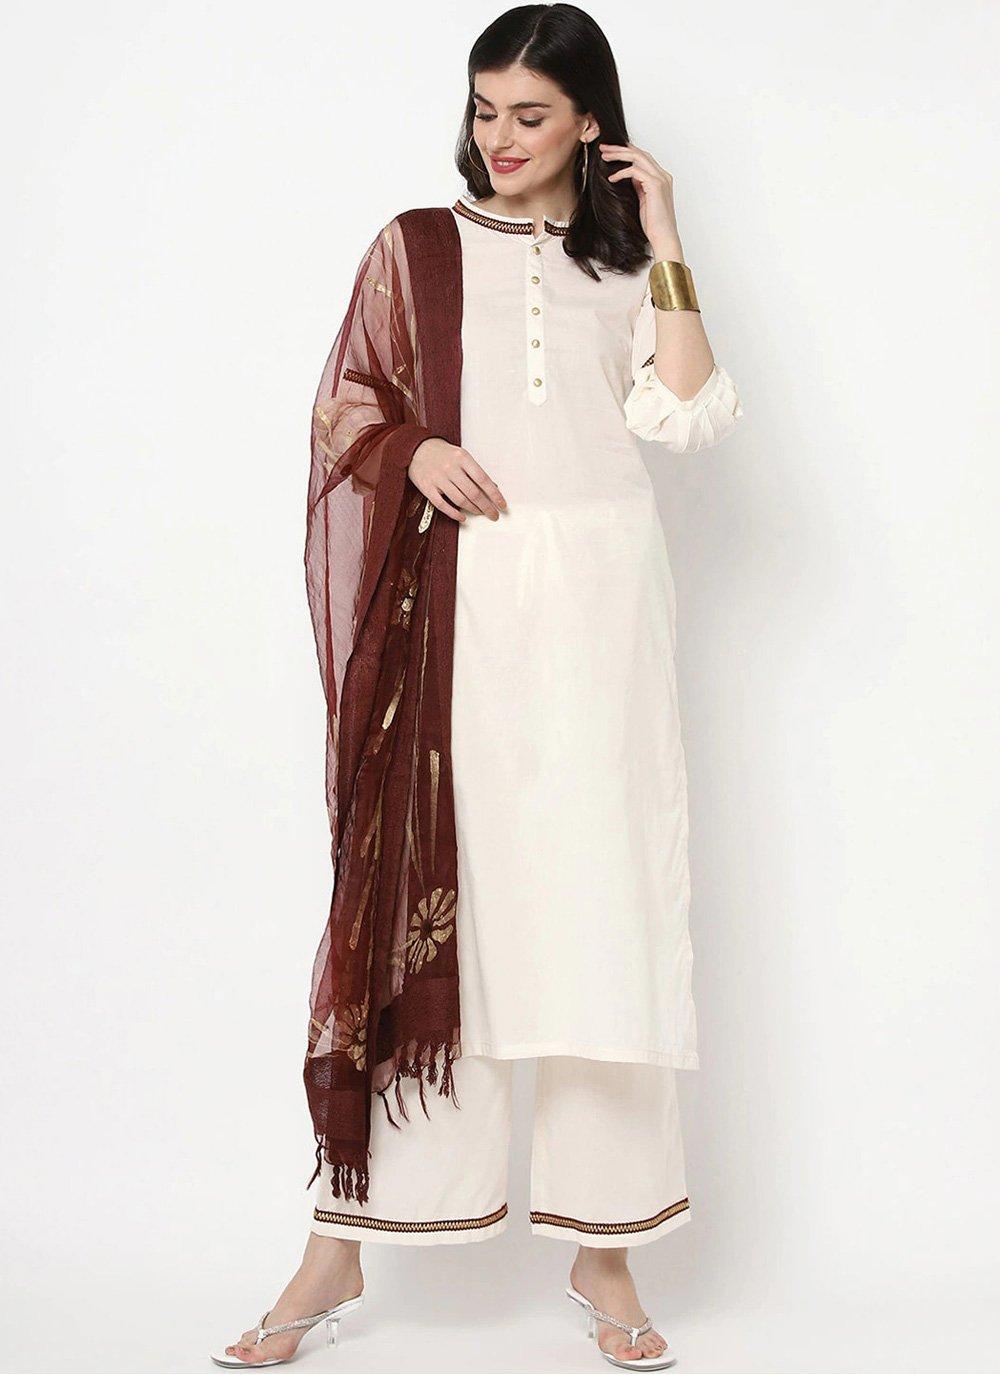 White Cotton Party Bollywood Salwar Kameez